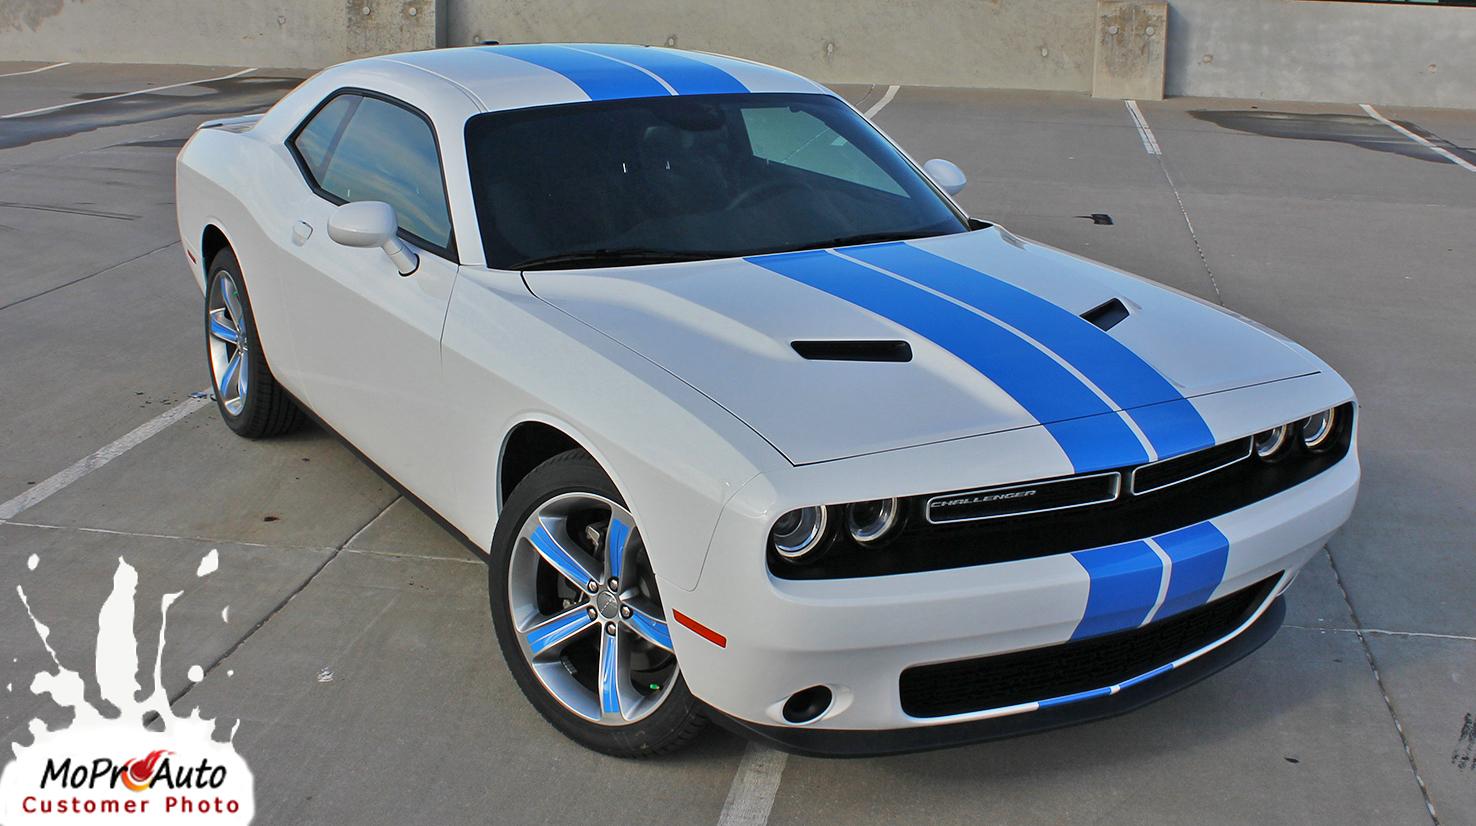 2015, 2016, 2017, 2018, 2019, 2020, 2021 Dodge Challenger RALLY Vinyl Graphics, Stripes and Decals Set